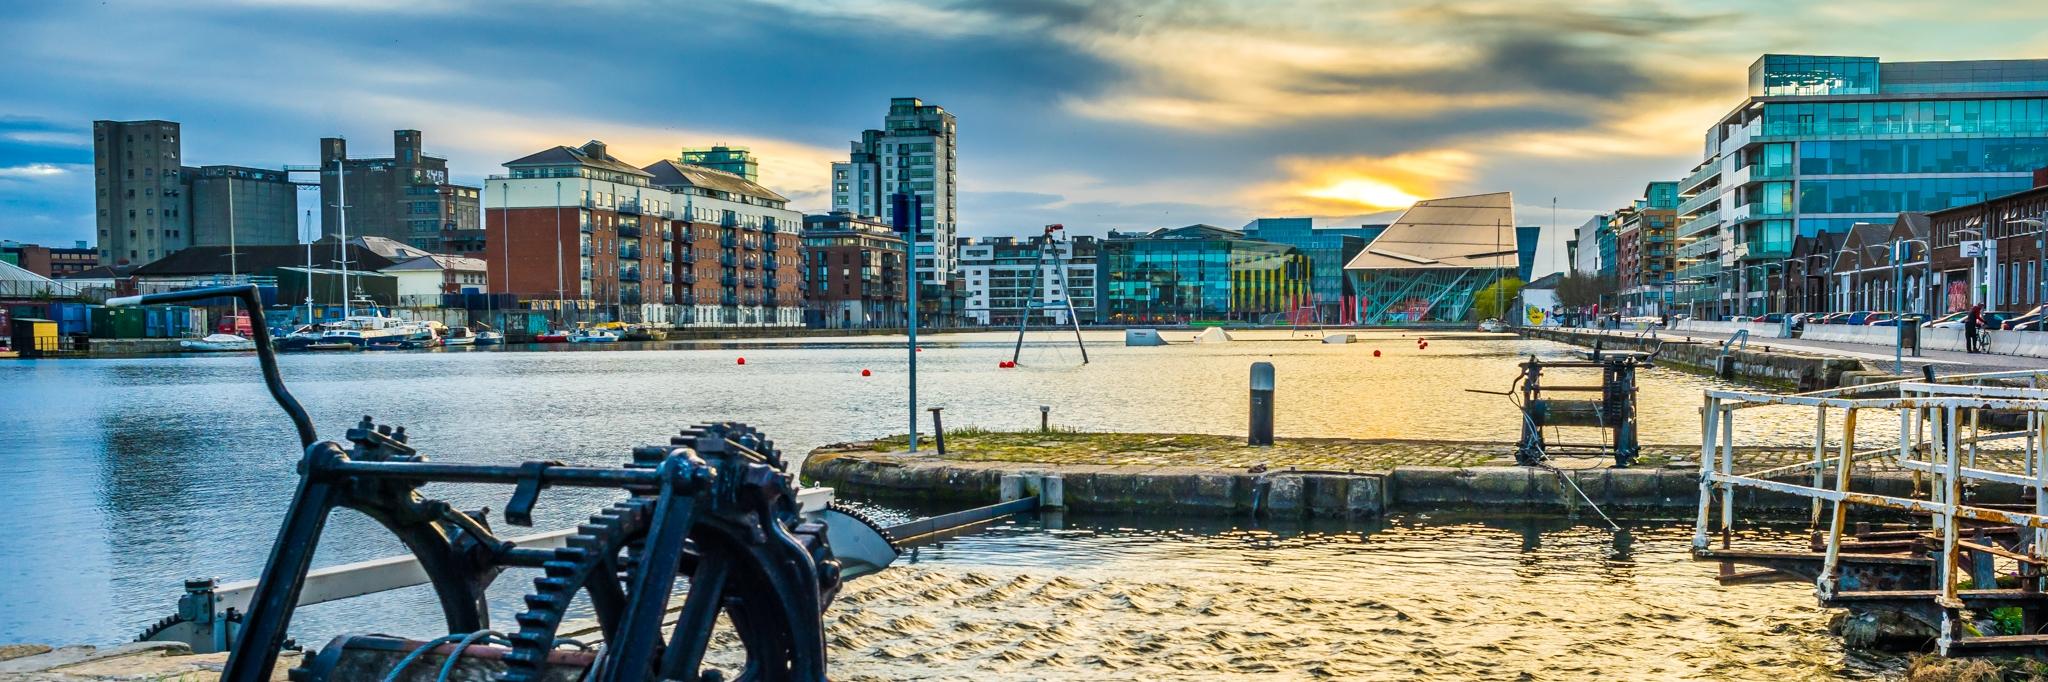 Top Travel Destinations Dublin Ireland Thumbnail